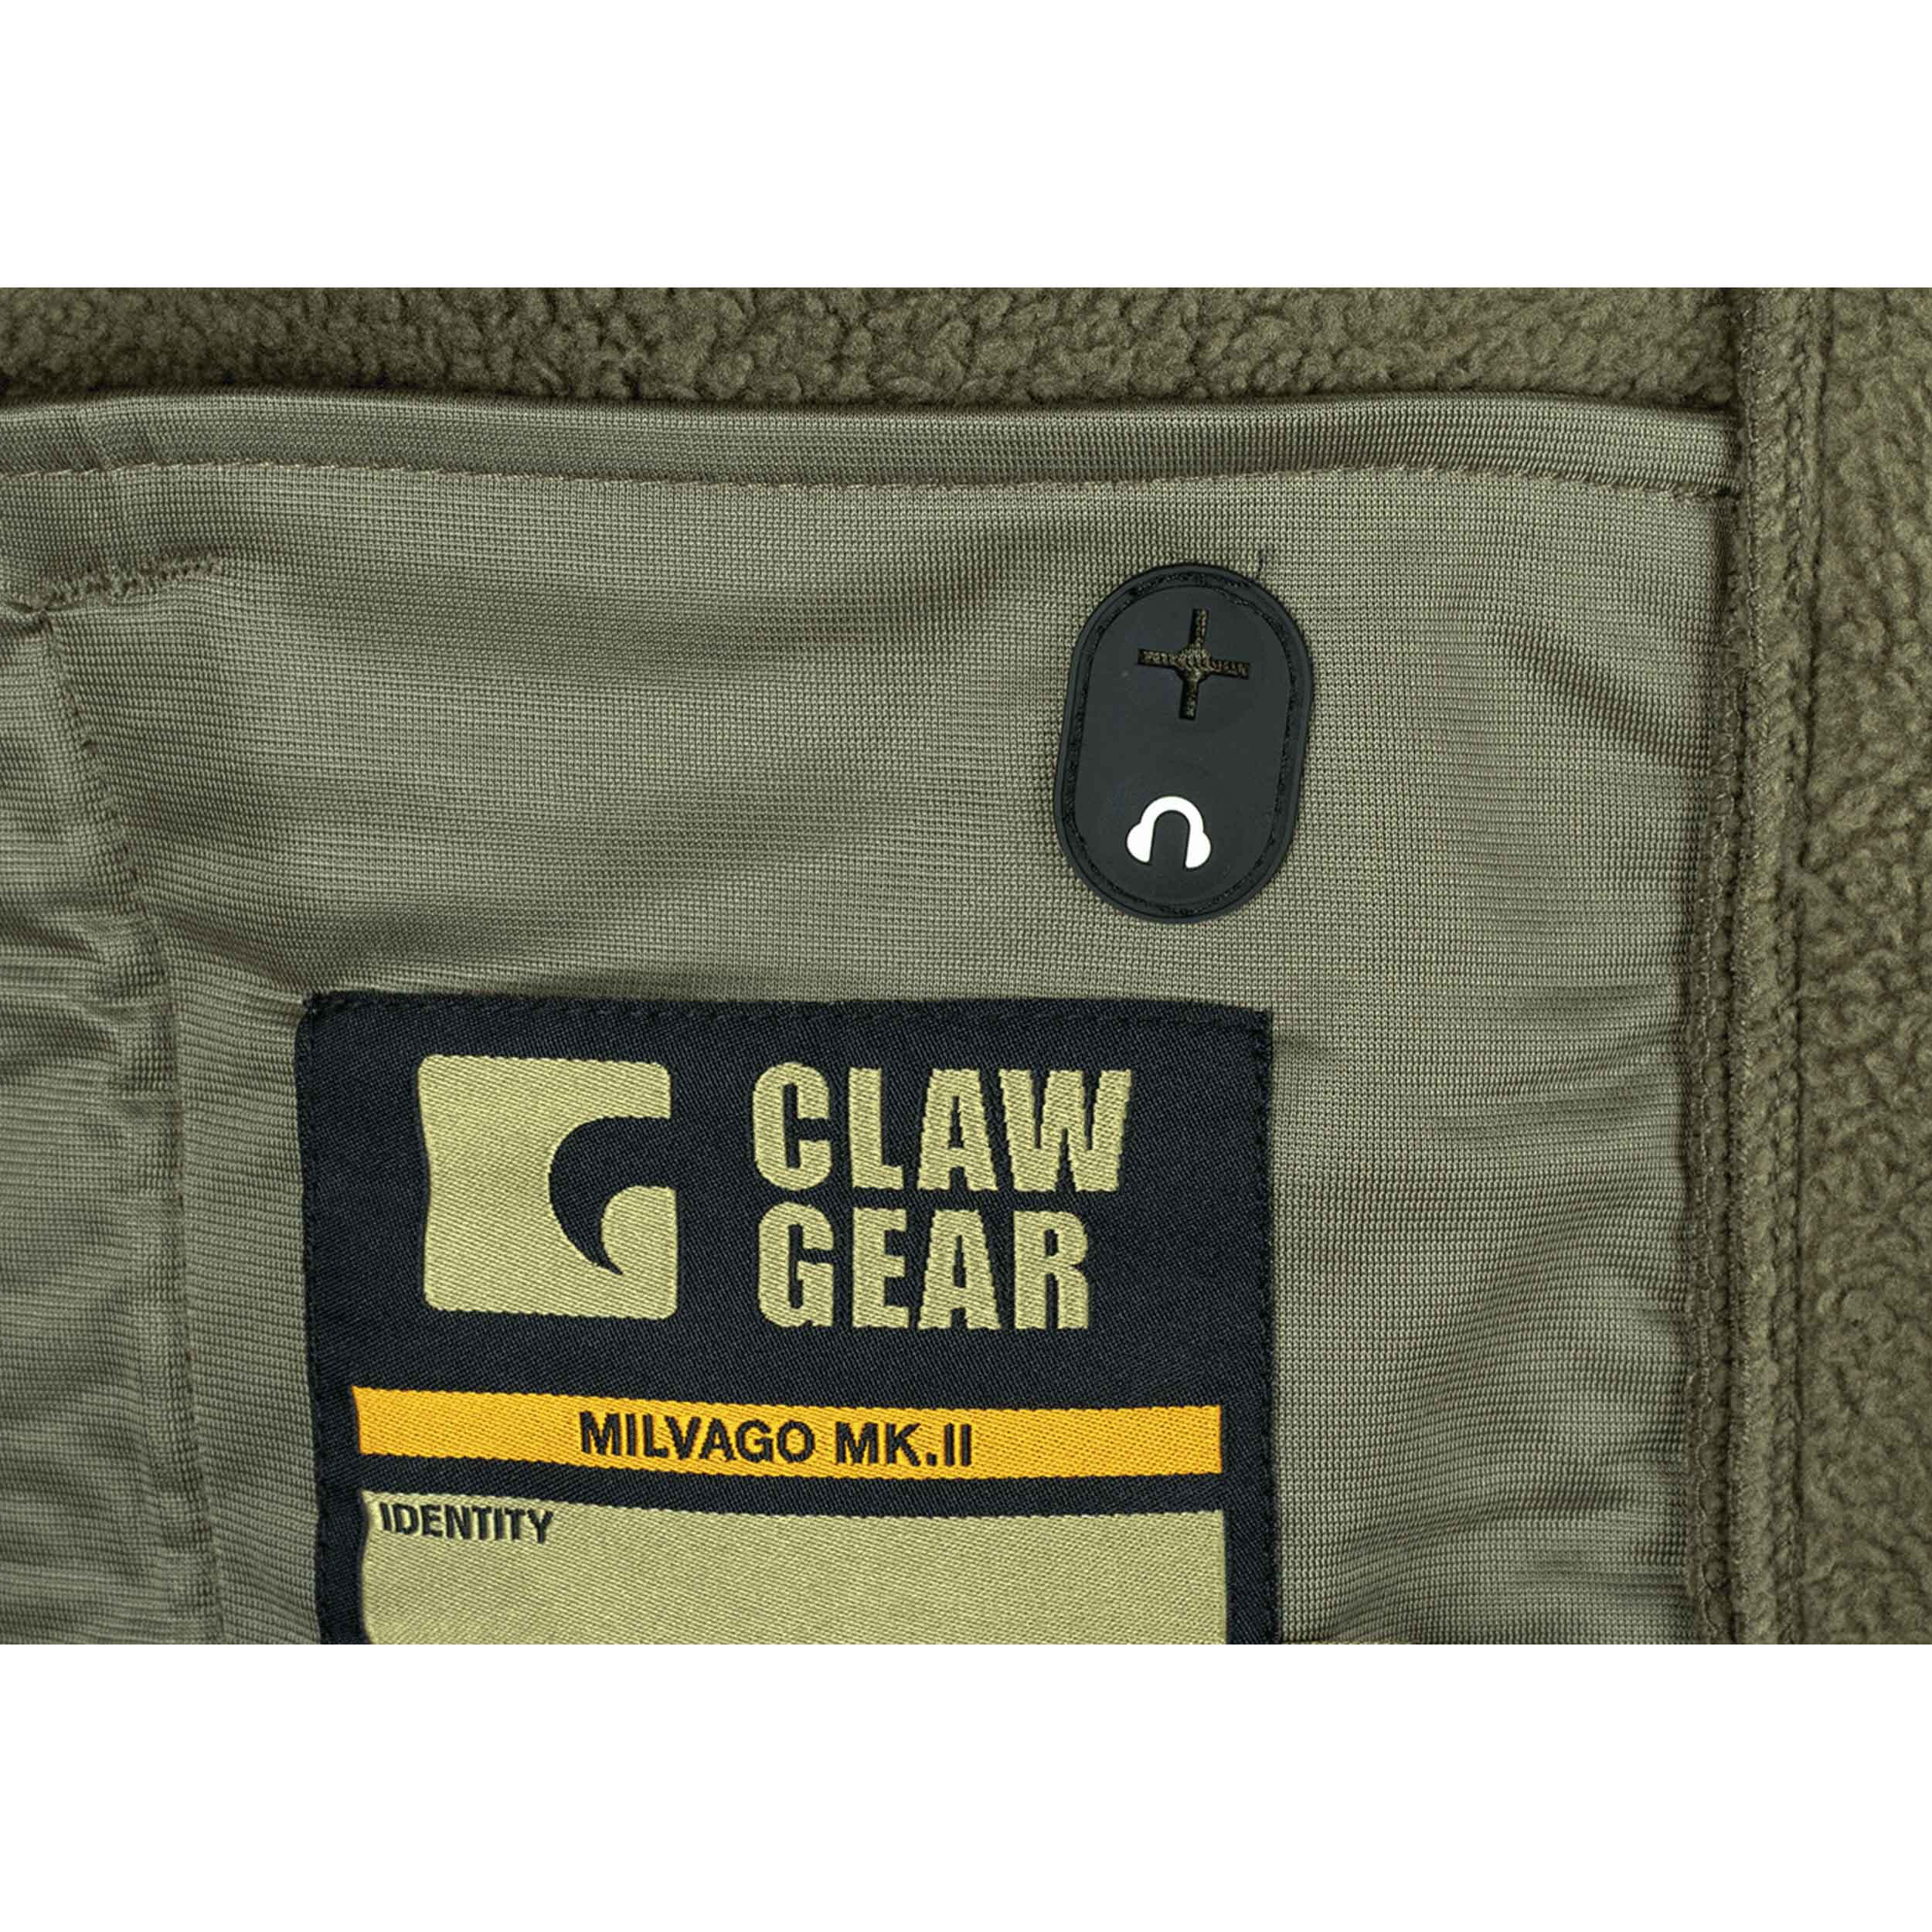 Oliv Gr/ün Clawgear Aviceda MK.II Leichter Fleece-Hoody atmungsaktiv RAL7013